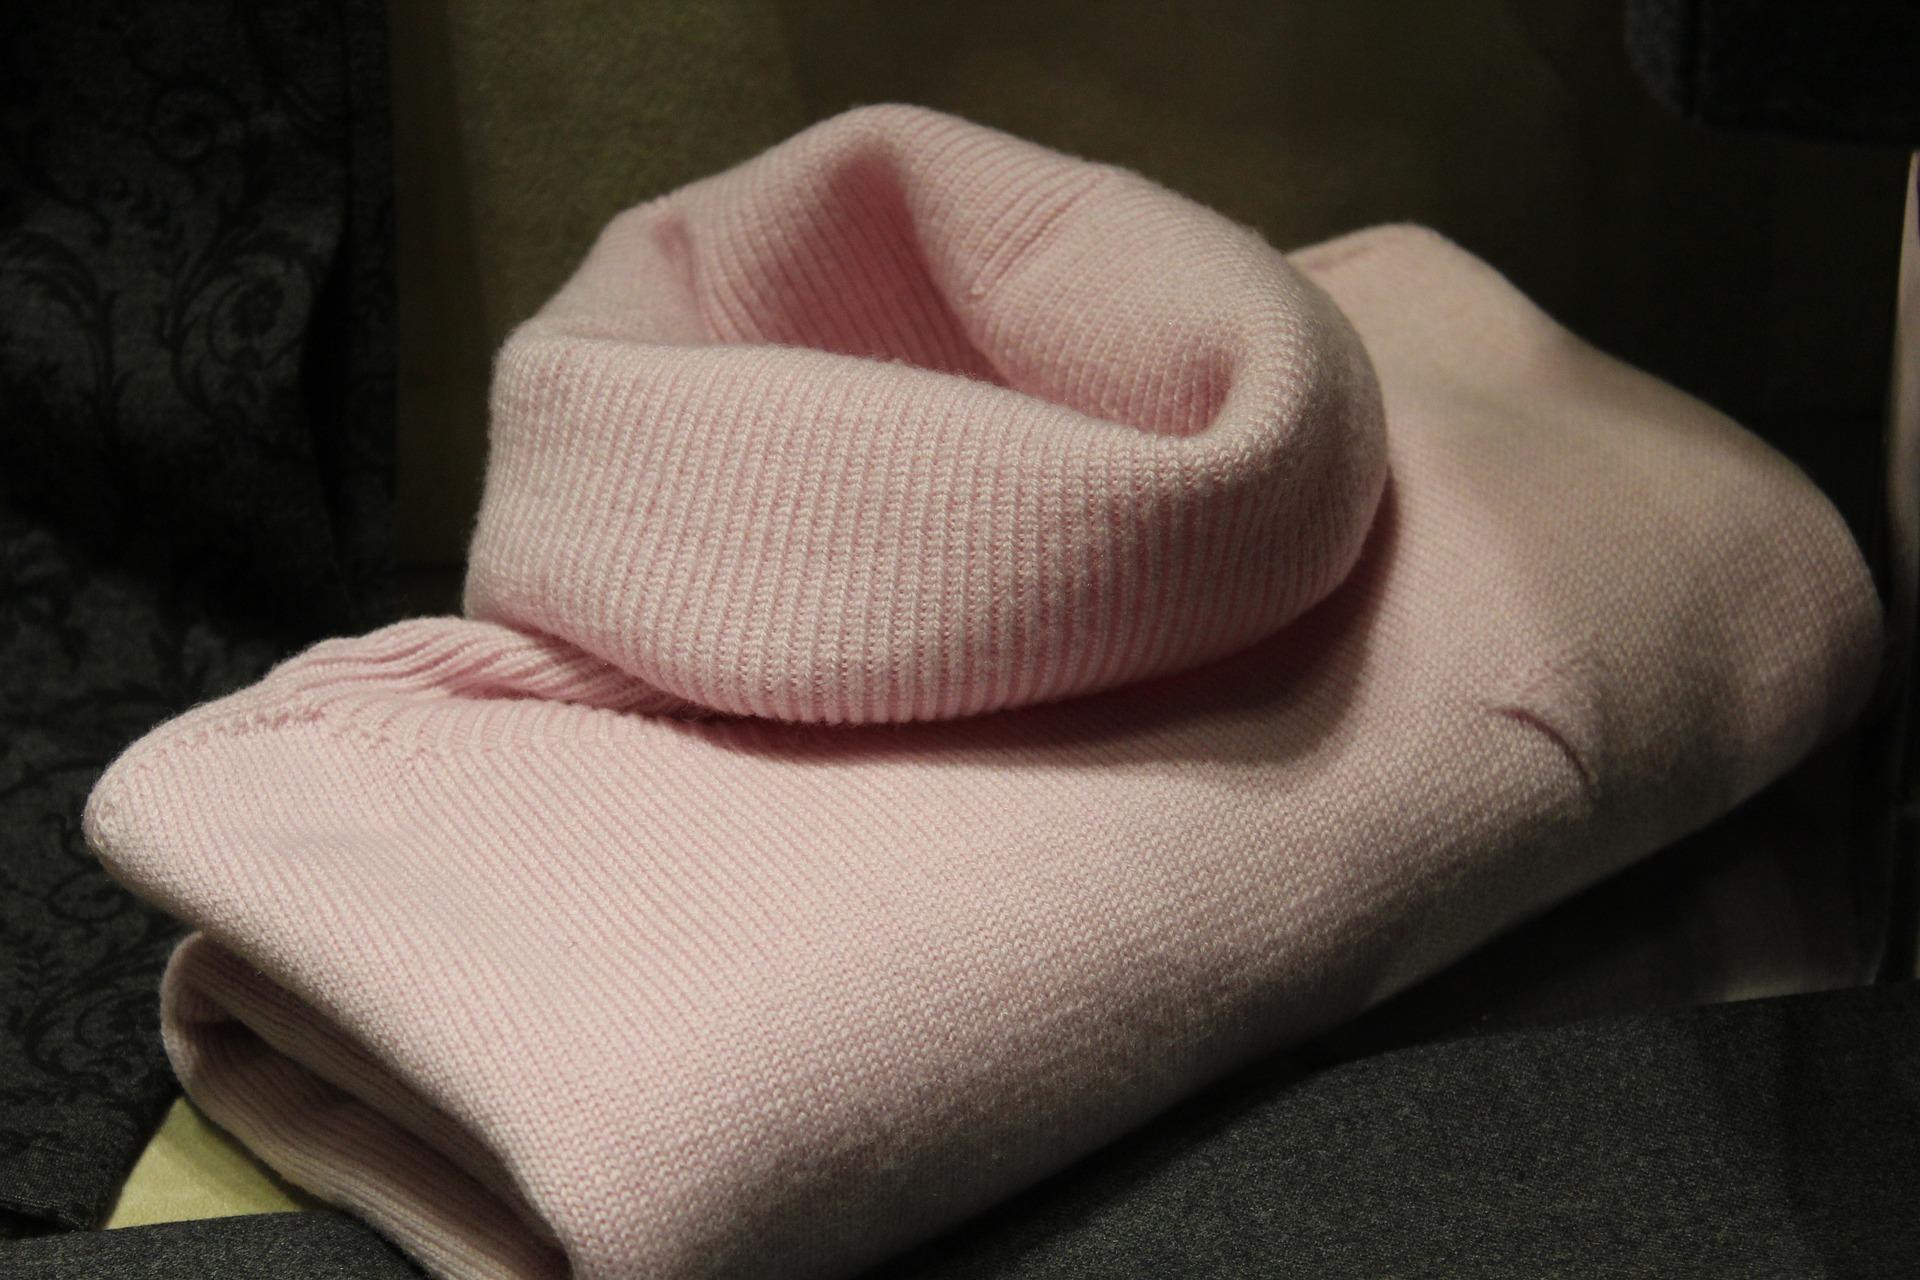 lana sudore